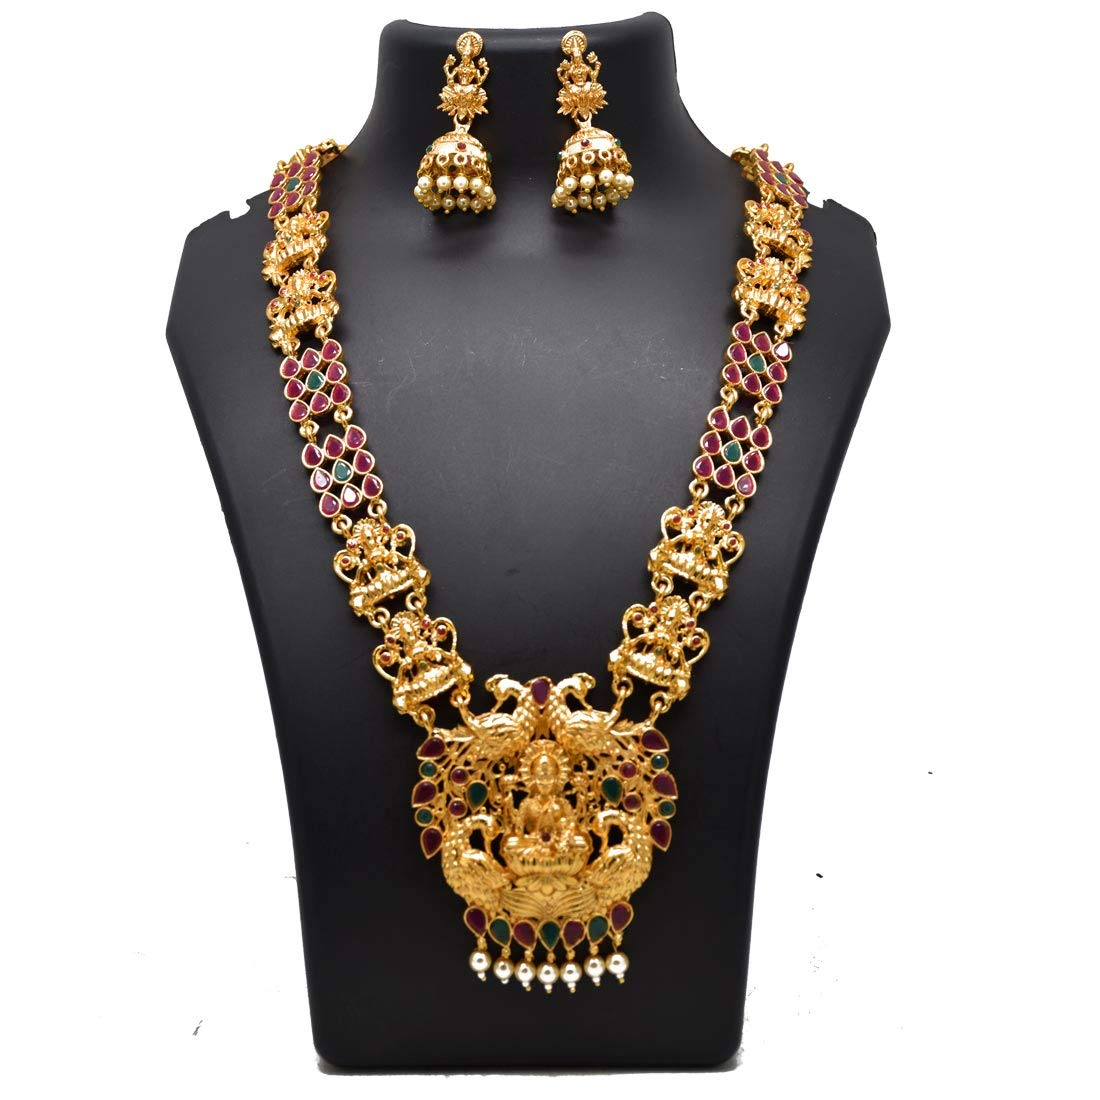 Kollam Supreme Chettinad Lakshmi Peacock Ruby Emerald Long Necklace Set